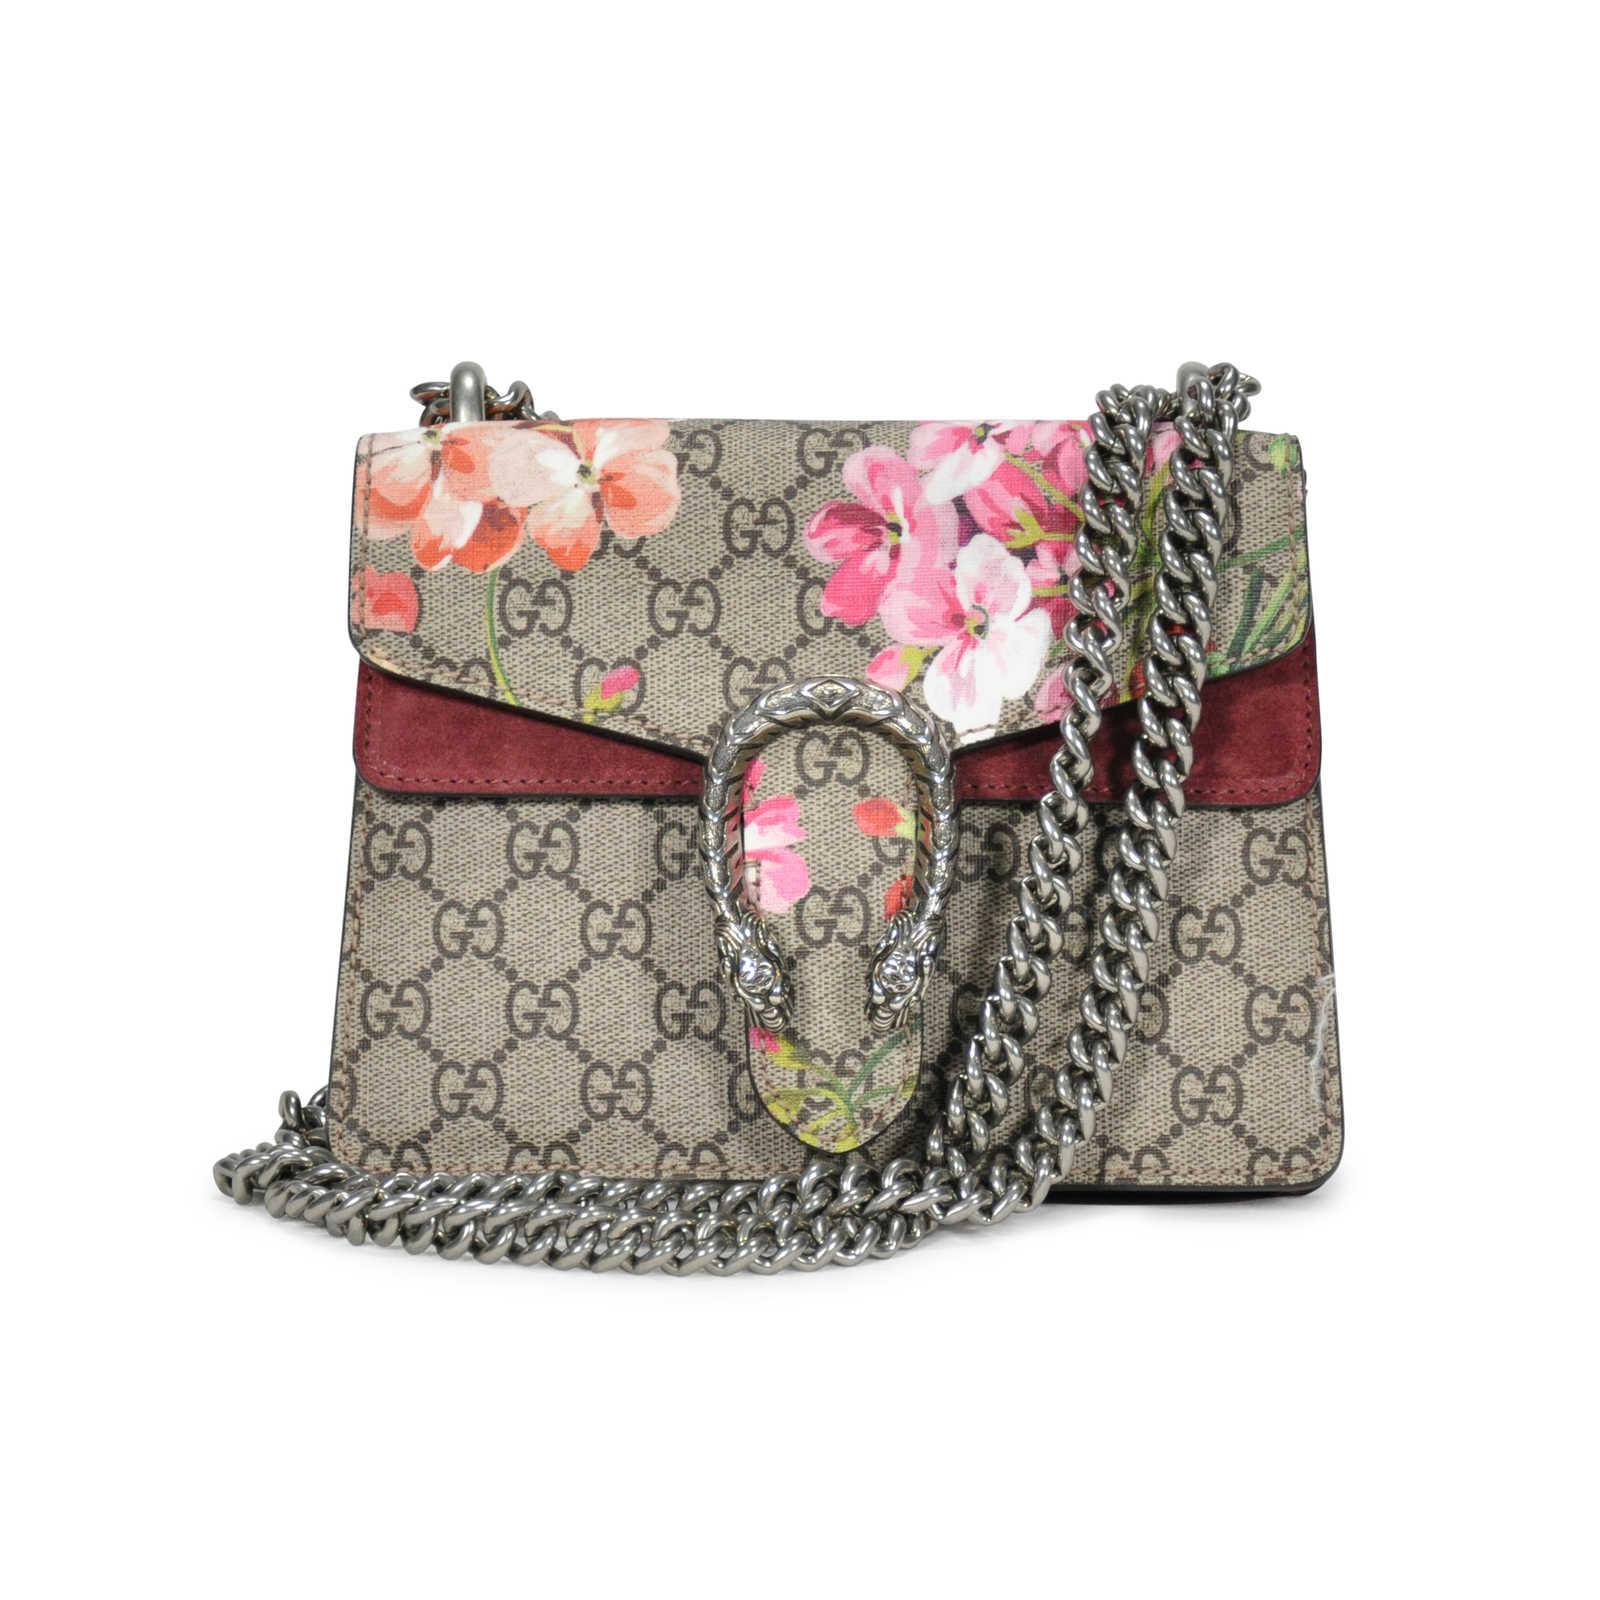 8edb66c952a5 Authentic Second Hand Gucci Dionysus Blooms Mini Shoulder Bag  (PSS-249-00004) ...